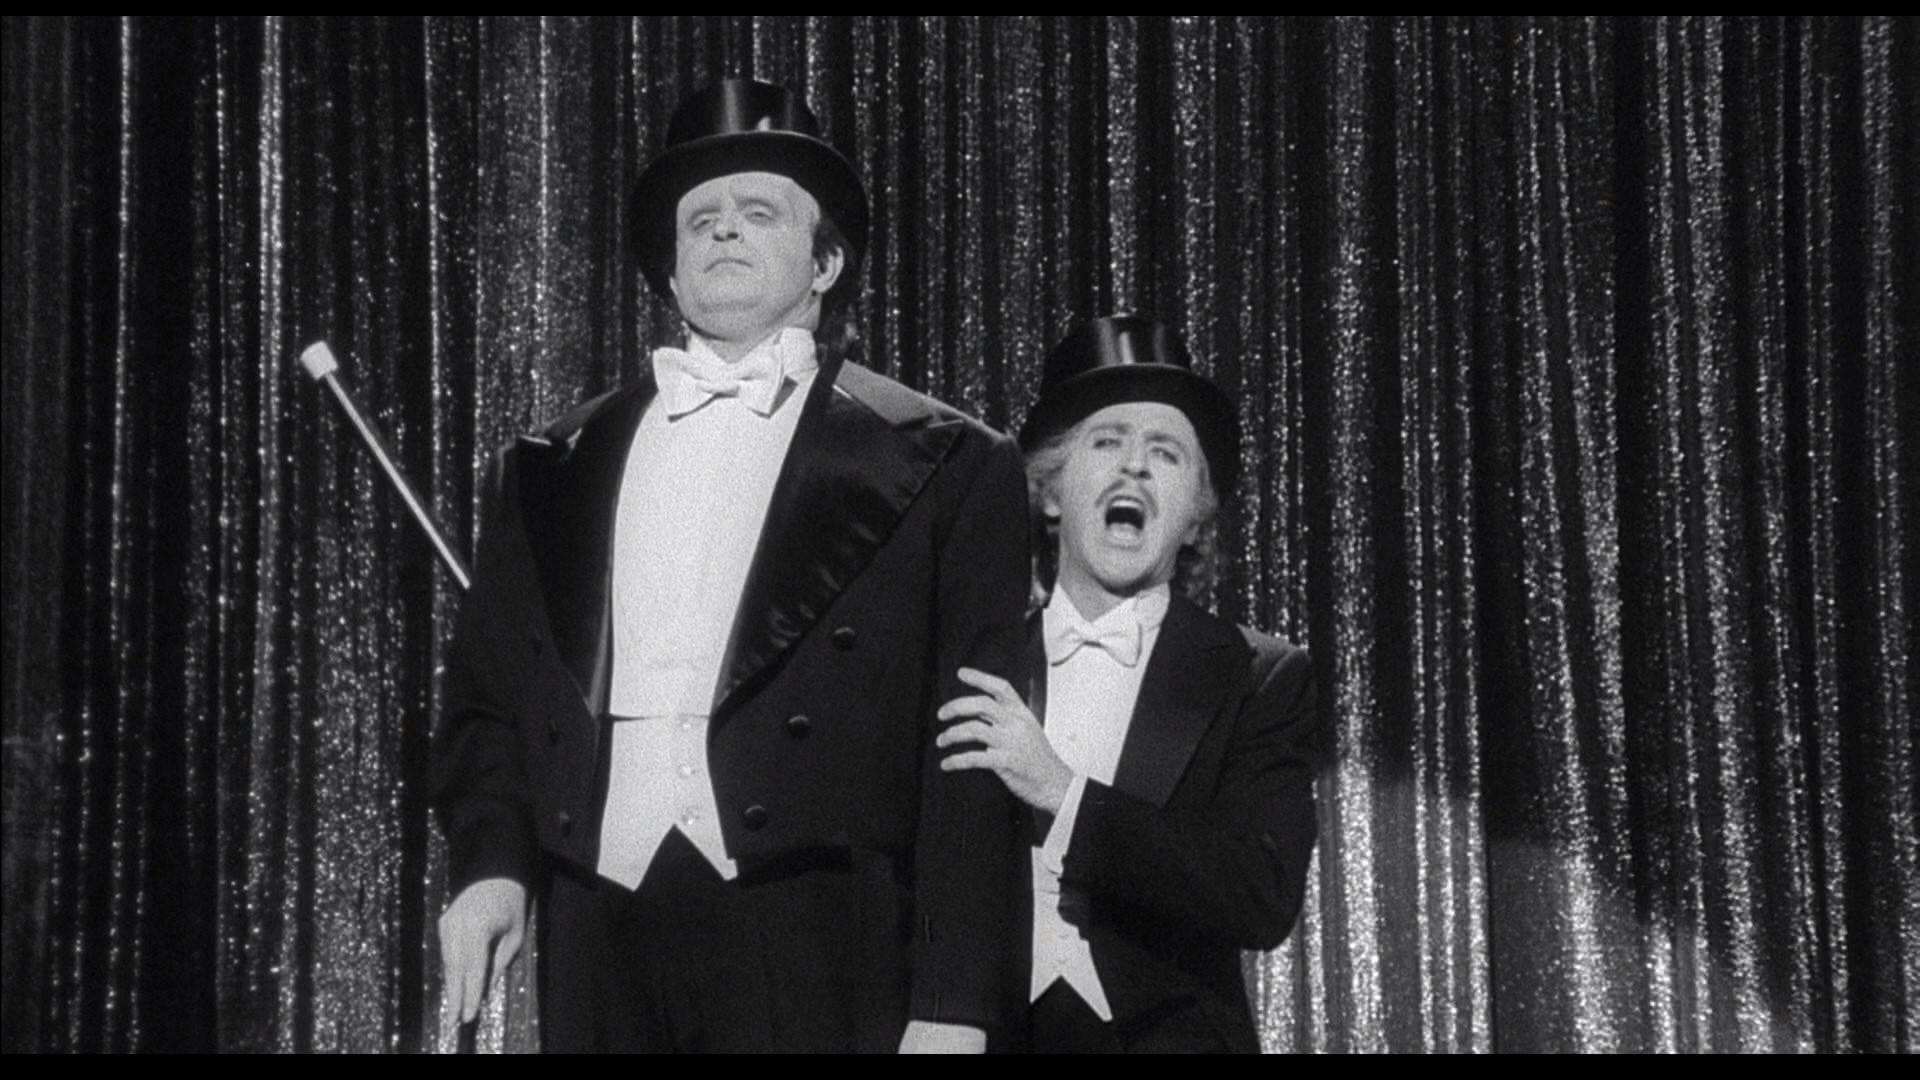 Gene Wilder and Peter Boyle in Young Frankenstein (1974)